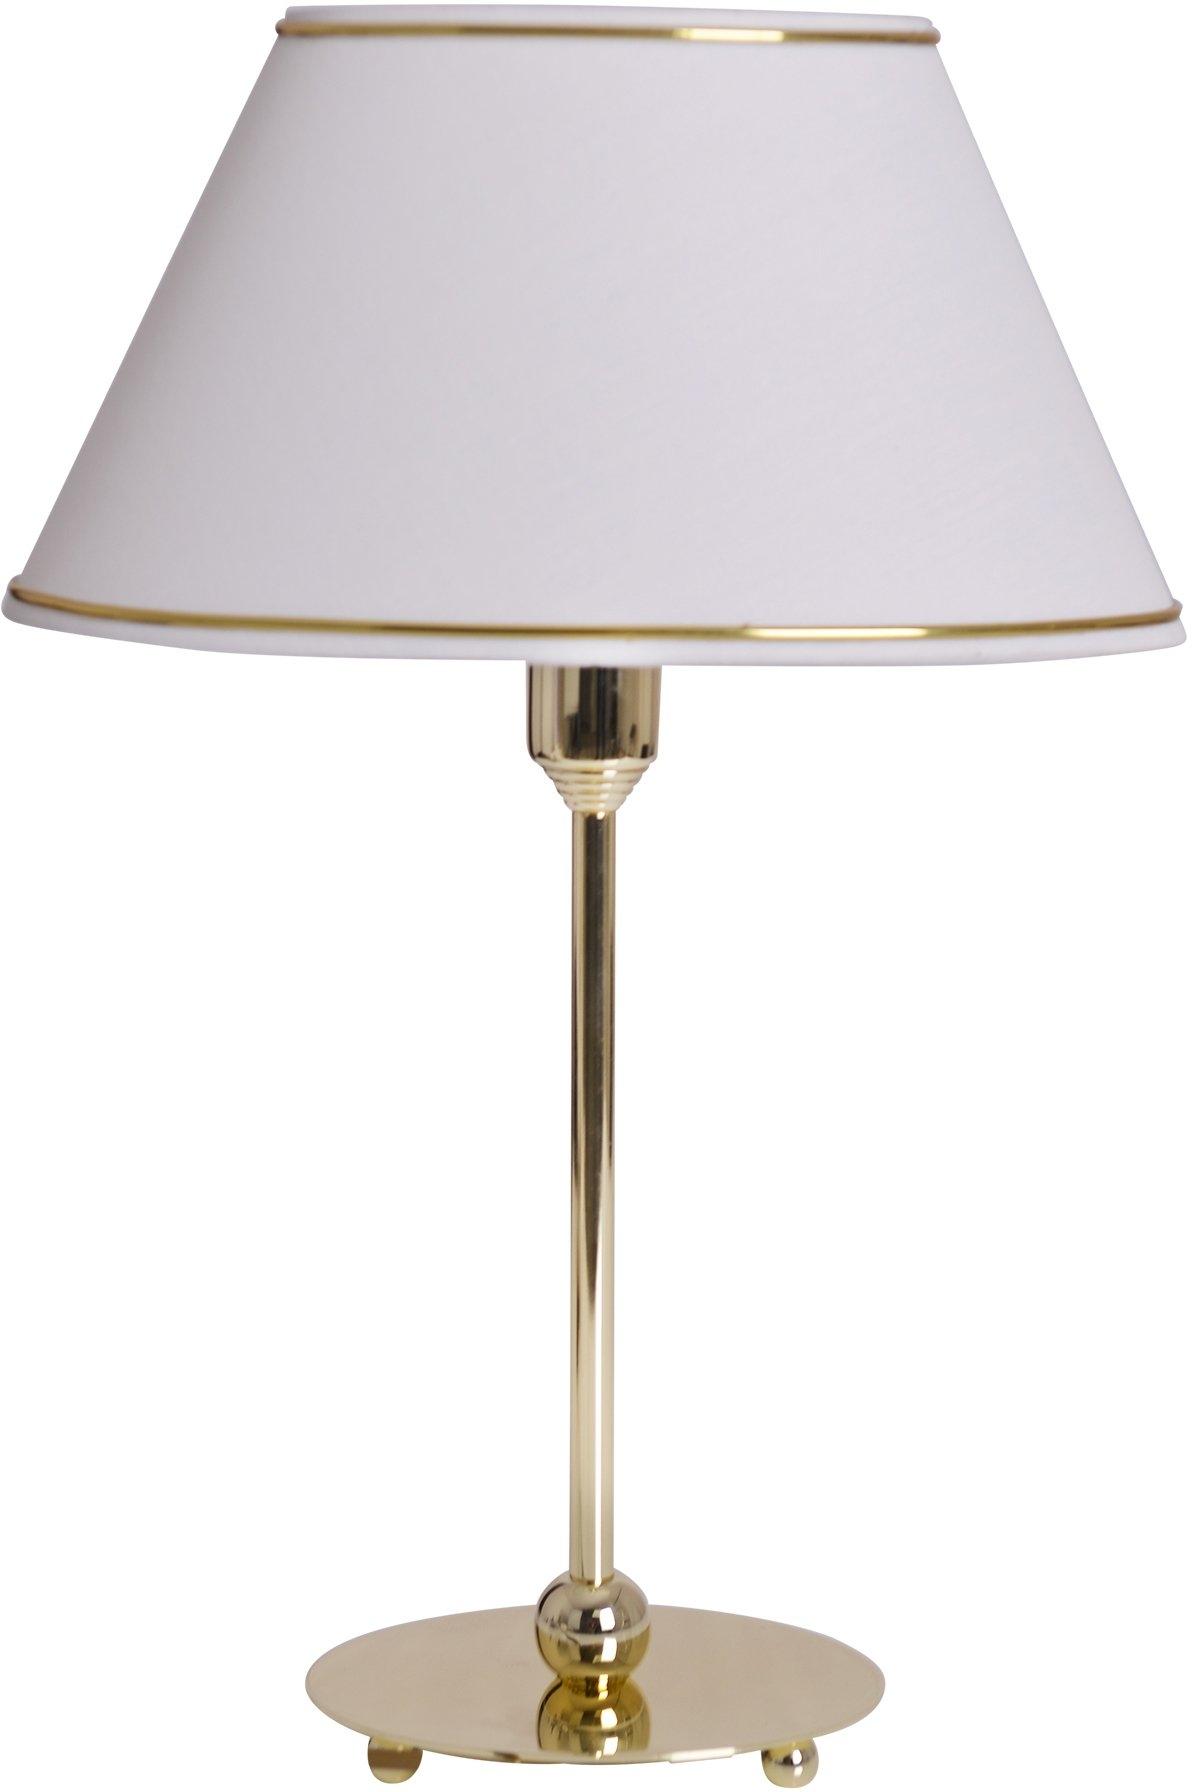 näve Tafellamp Keanu (1 stuk) nu online kopen bij OTTO